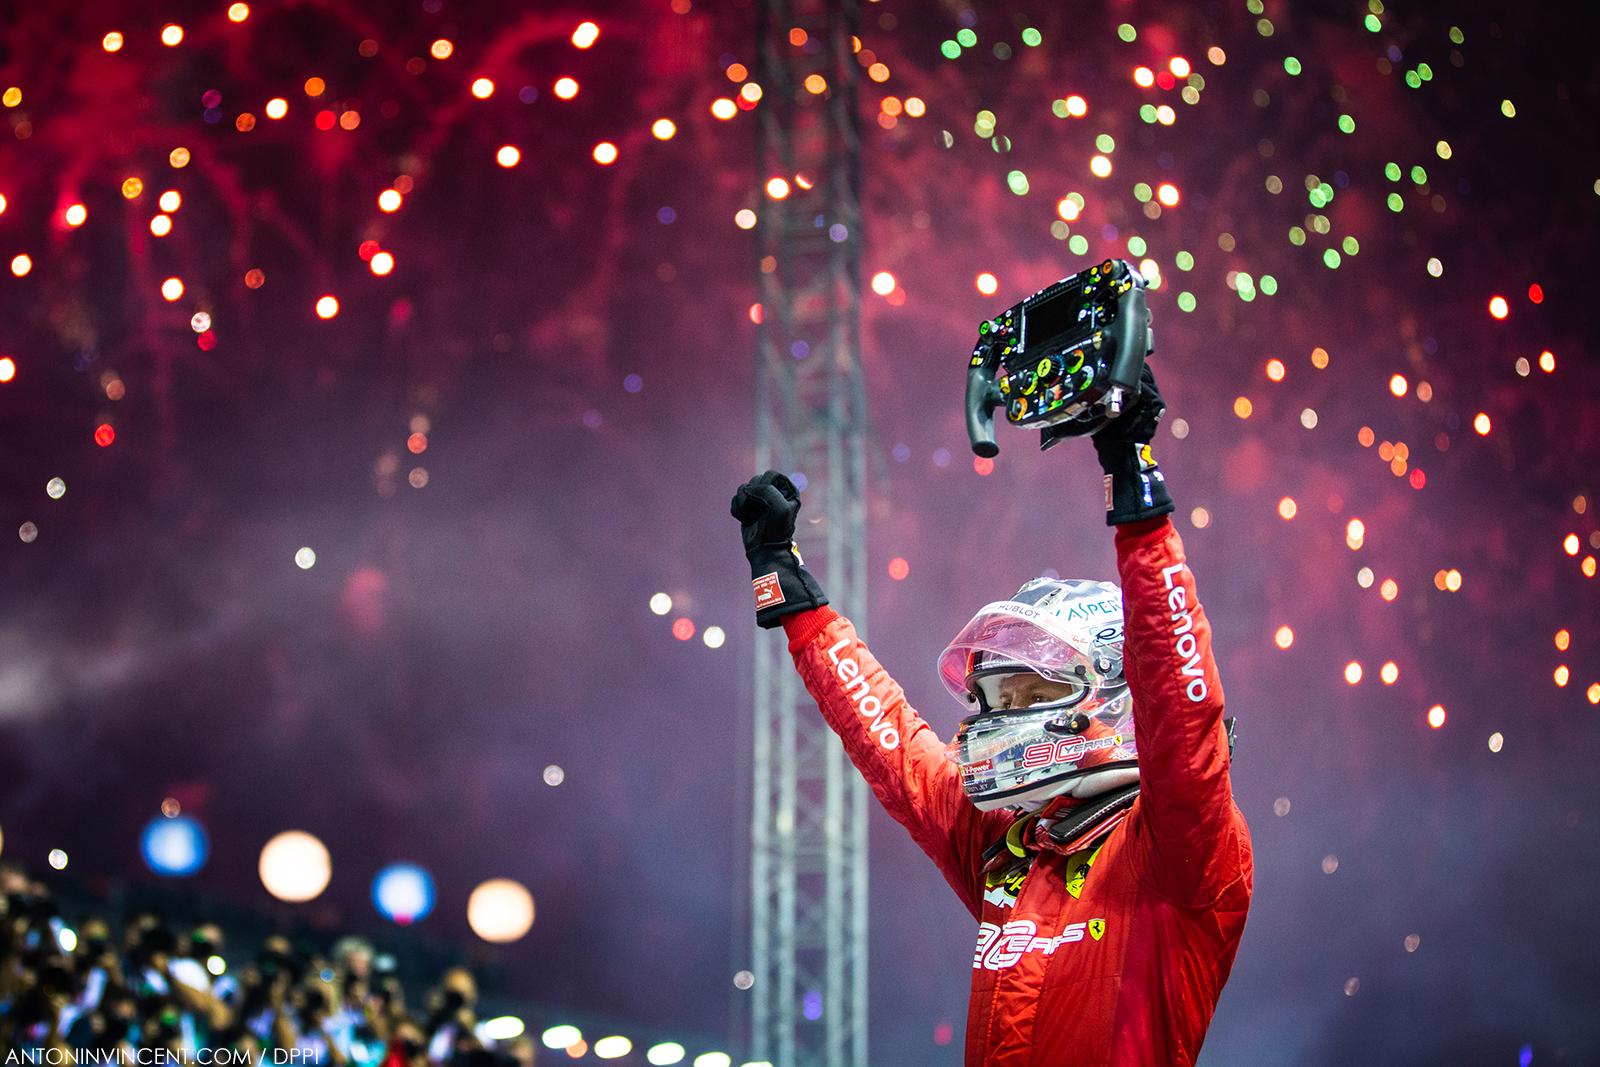 VETTEL Sebastian (ger), Scuderia Ferrari SF90, portrait celebration winning during the 2019 Formula One World Championship, Singapore Grand Prix from September 19 to 22 in Singapour - Photo Antonin Vincent / DPPI